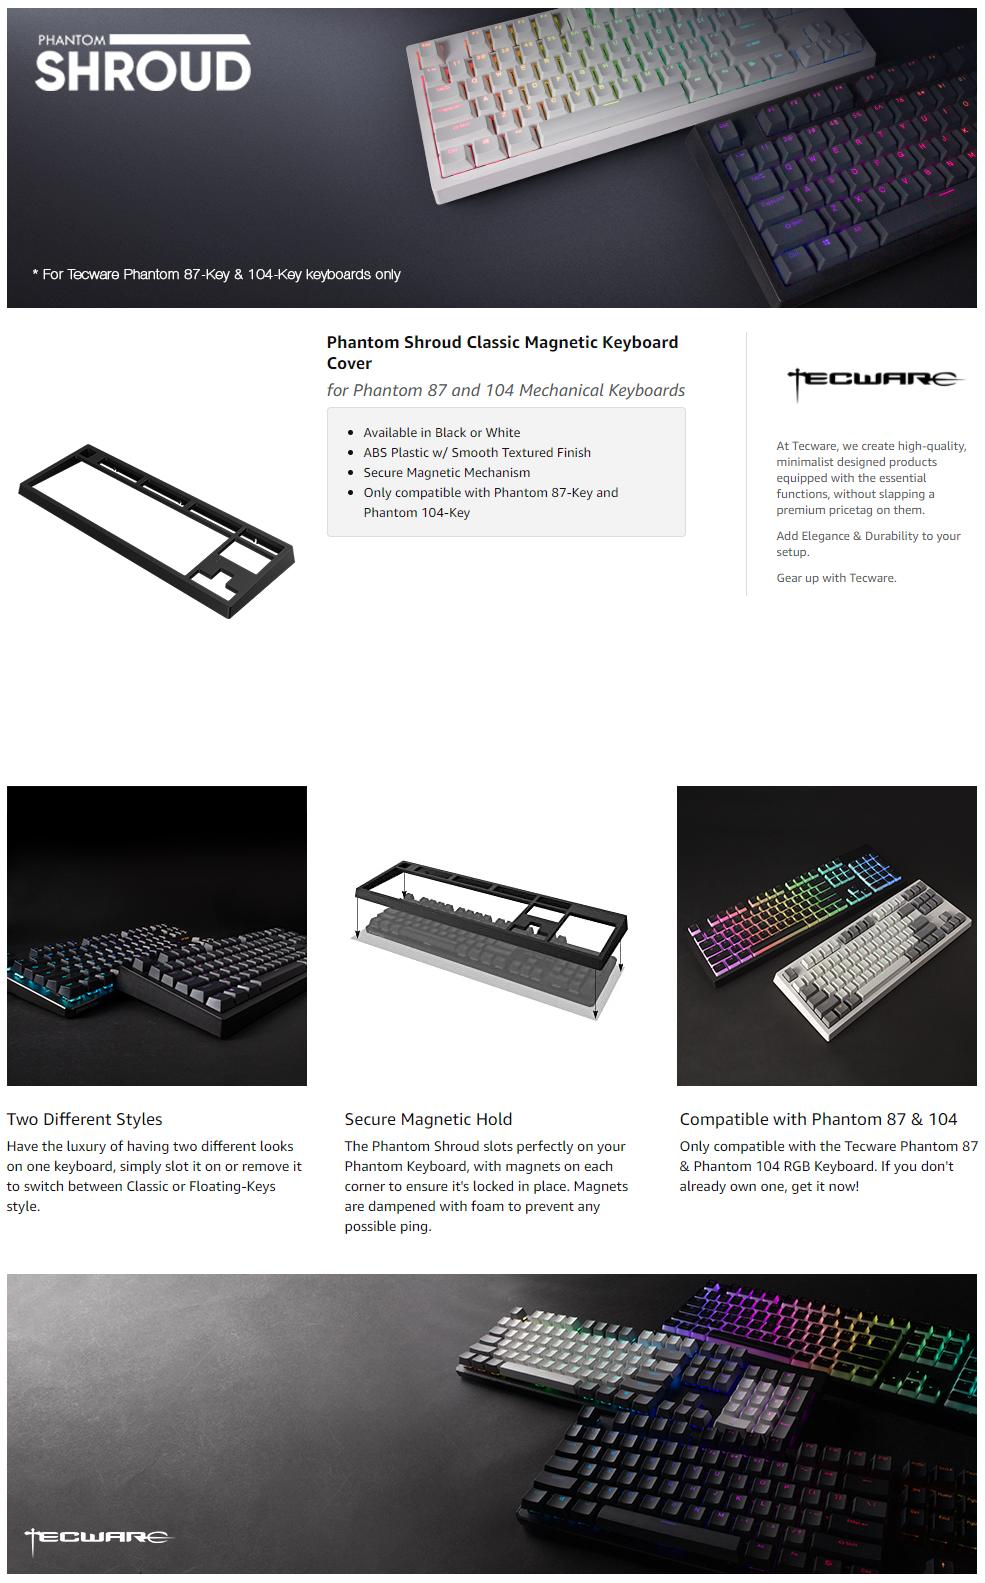 Tecware Shroud Classic Keyboard Cover For Phantom 104 Keys - (Black/White)  - Monaliza